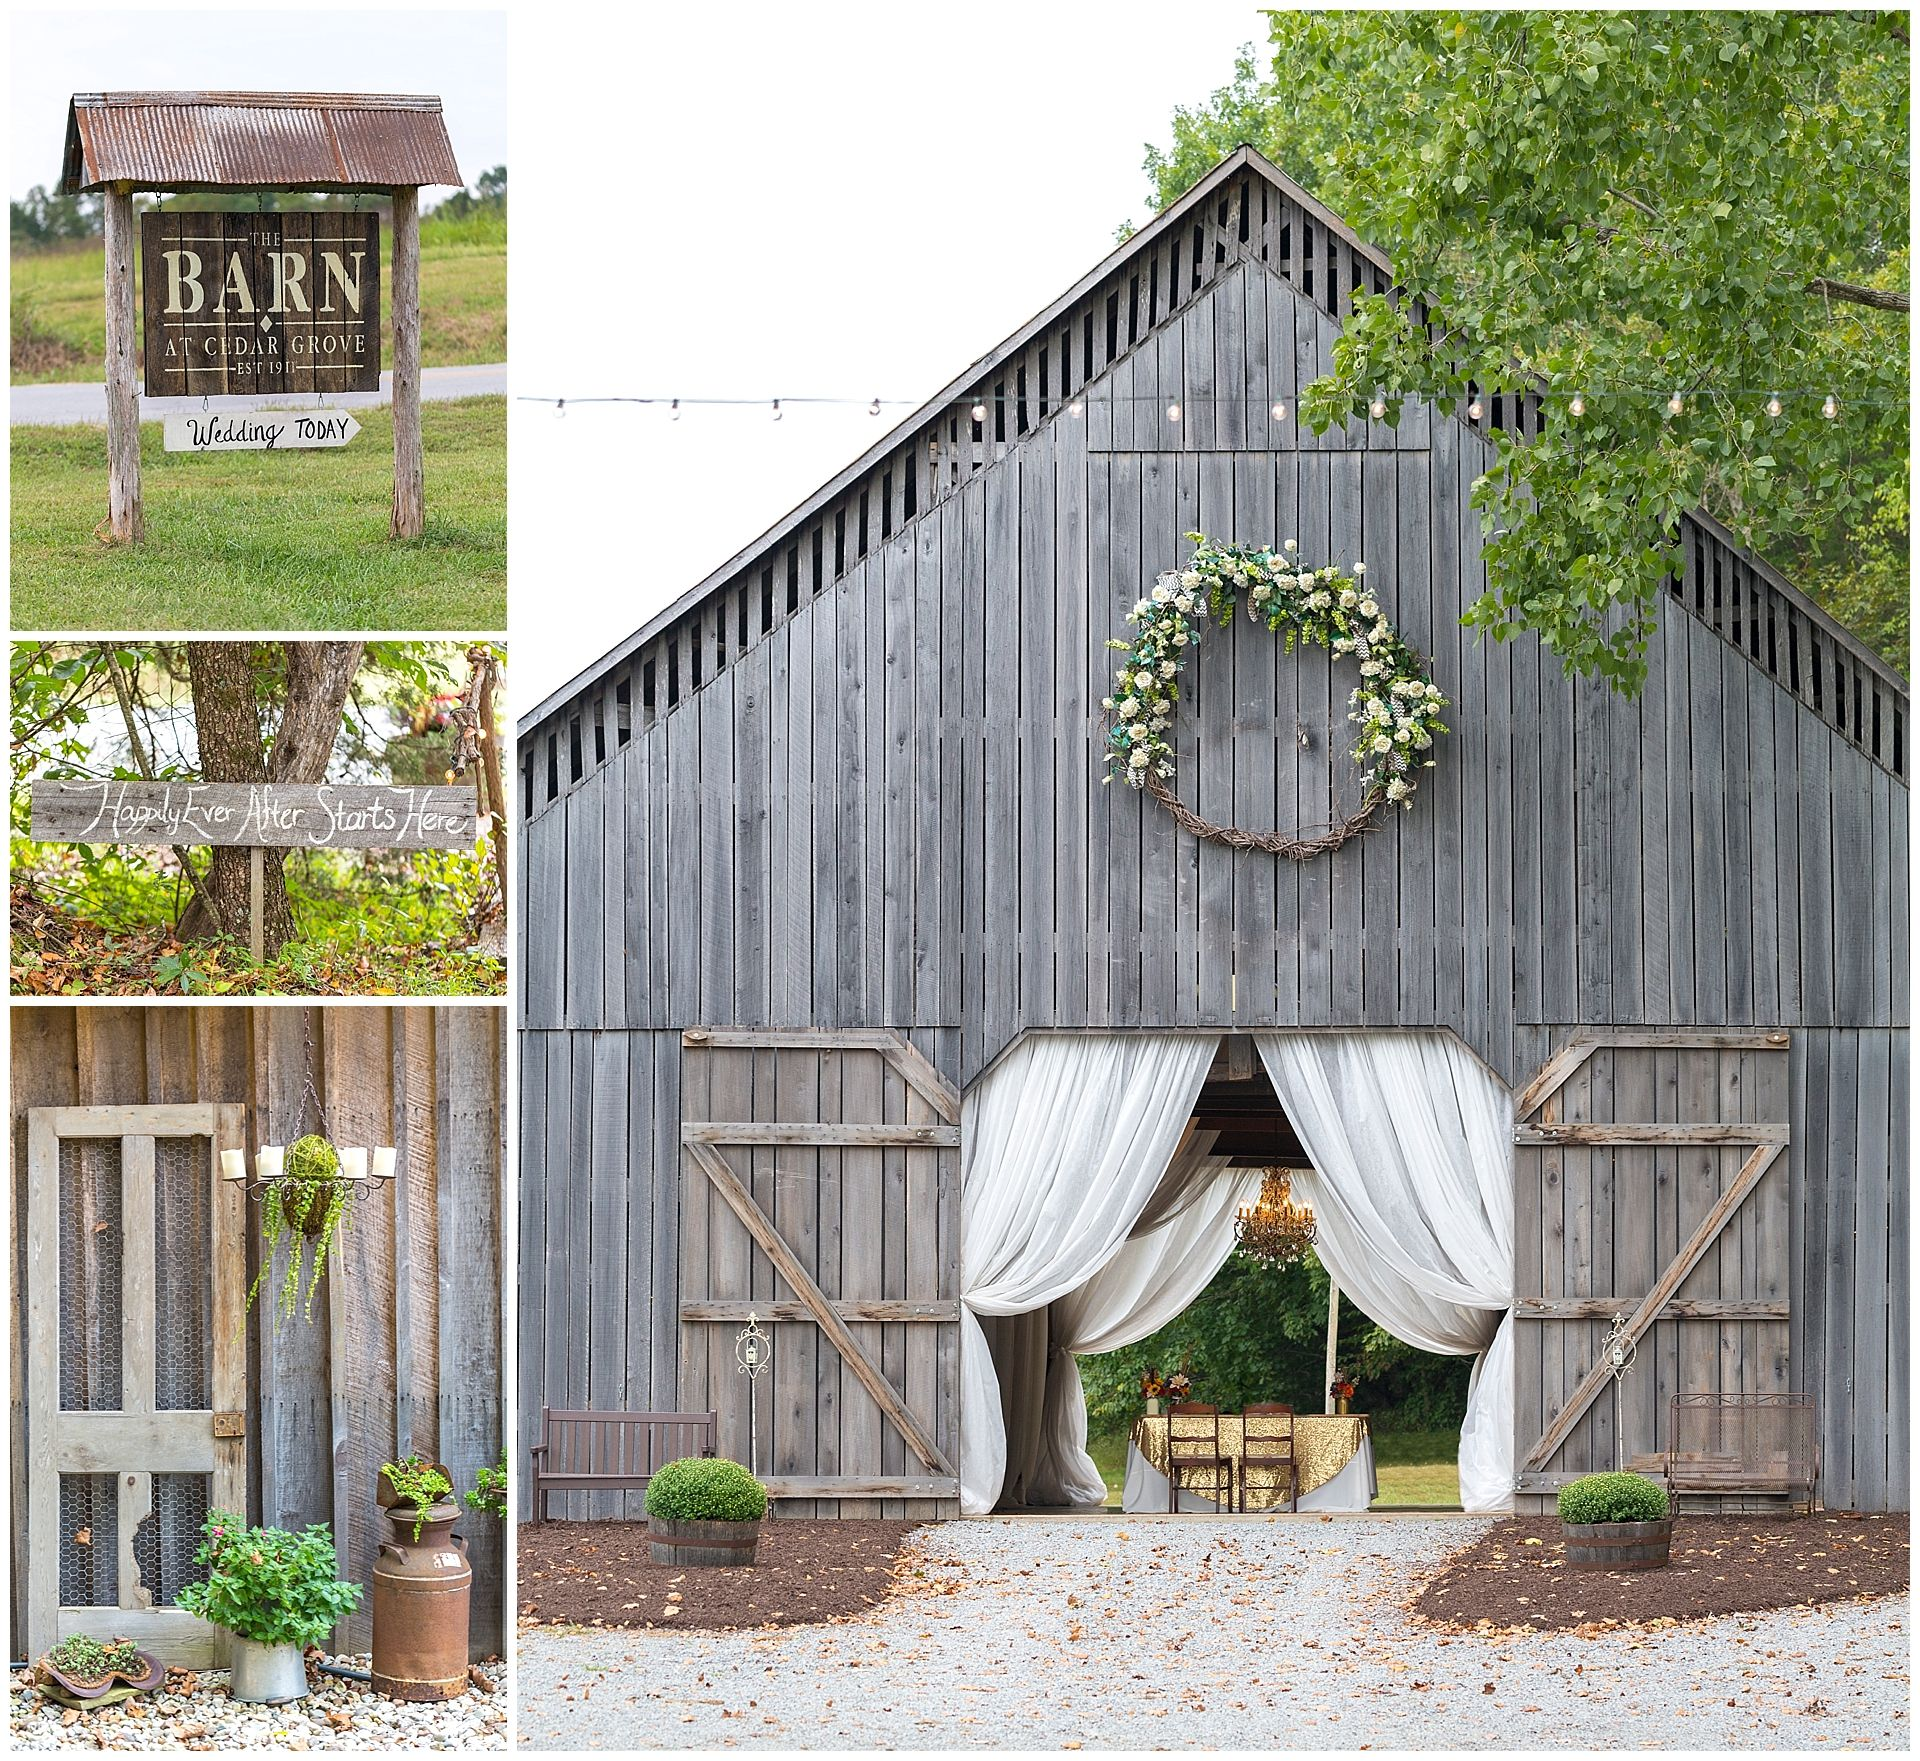 Rustic Wedding at the Barn at Cedar Grove in Greensburg ...